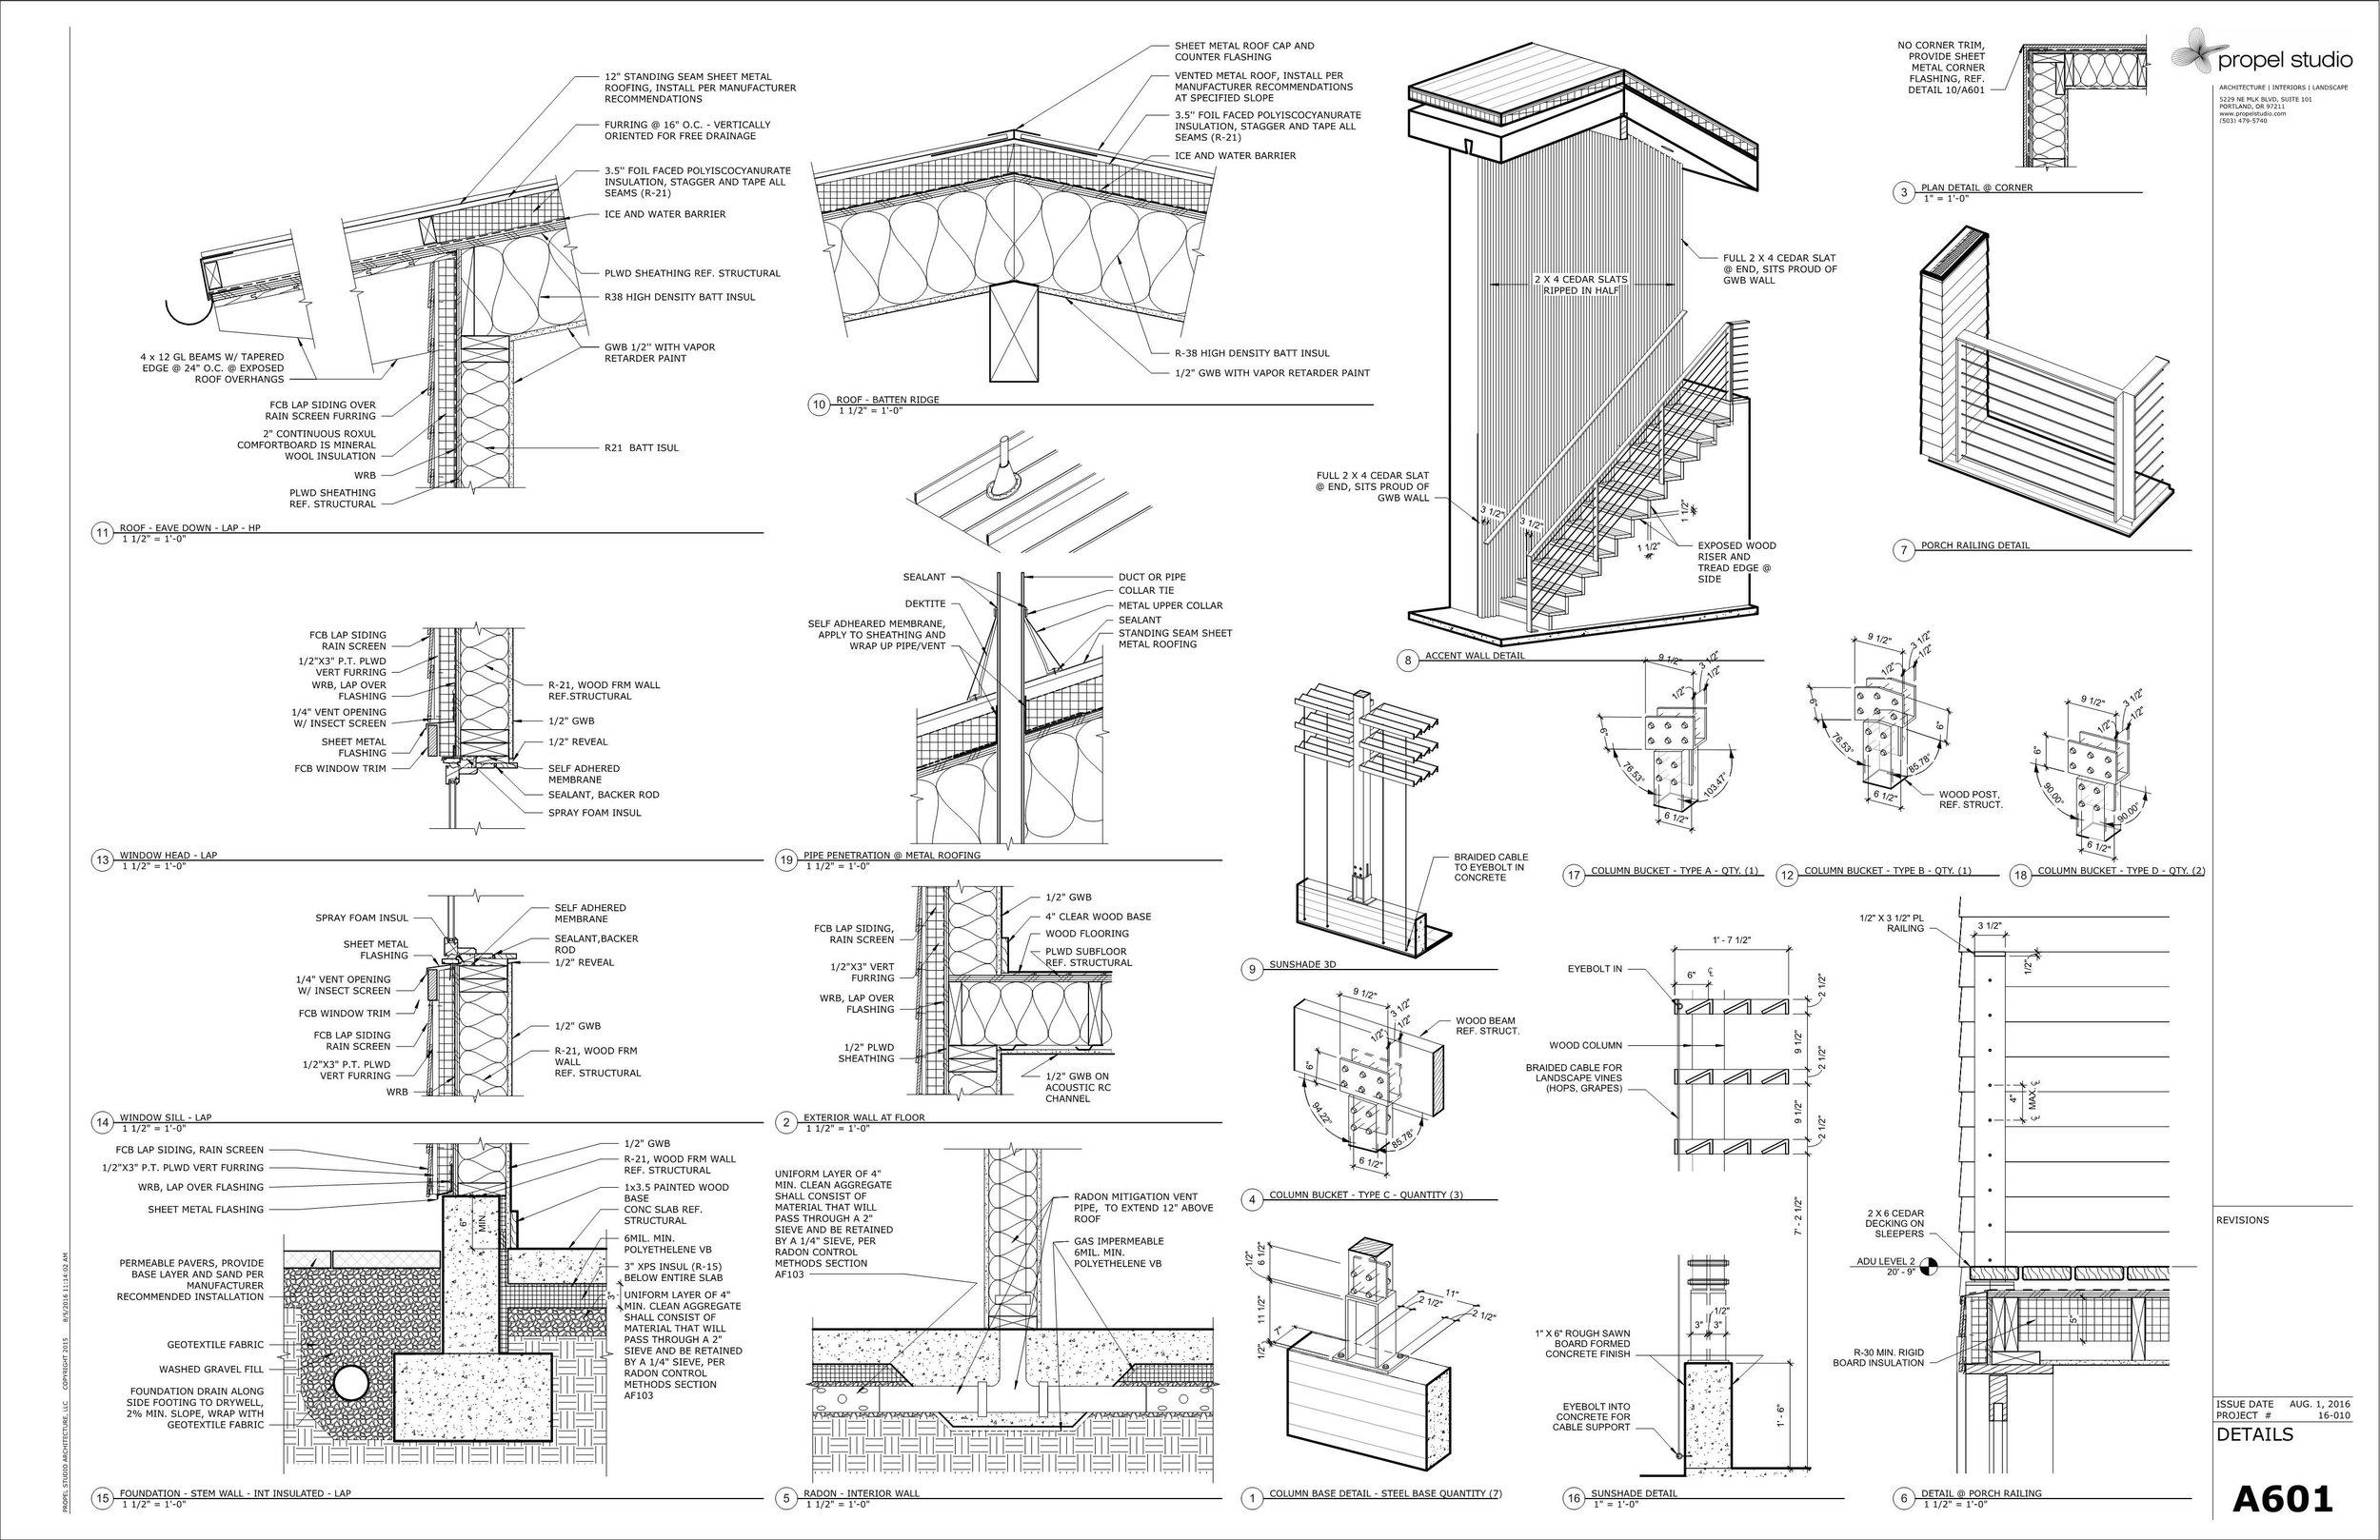 The Propel Studio Design Process — Propel Studio